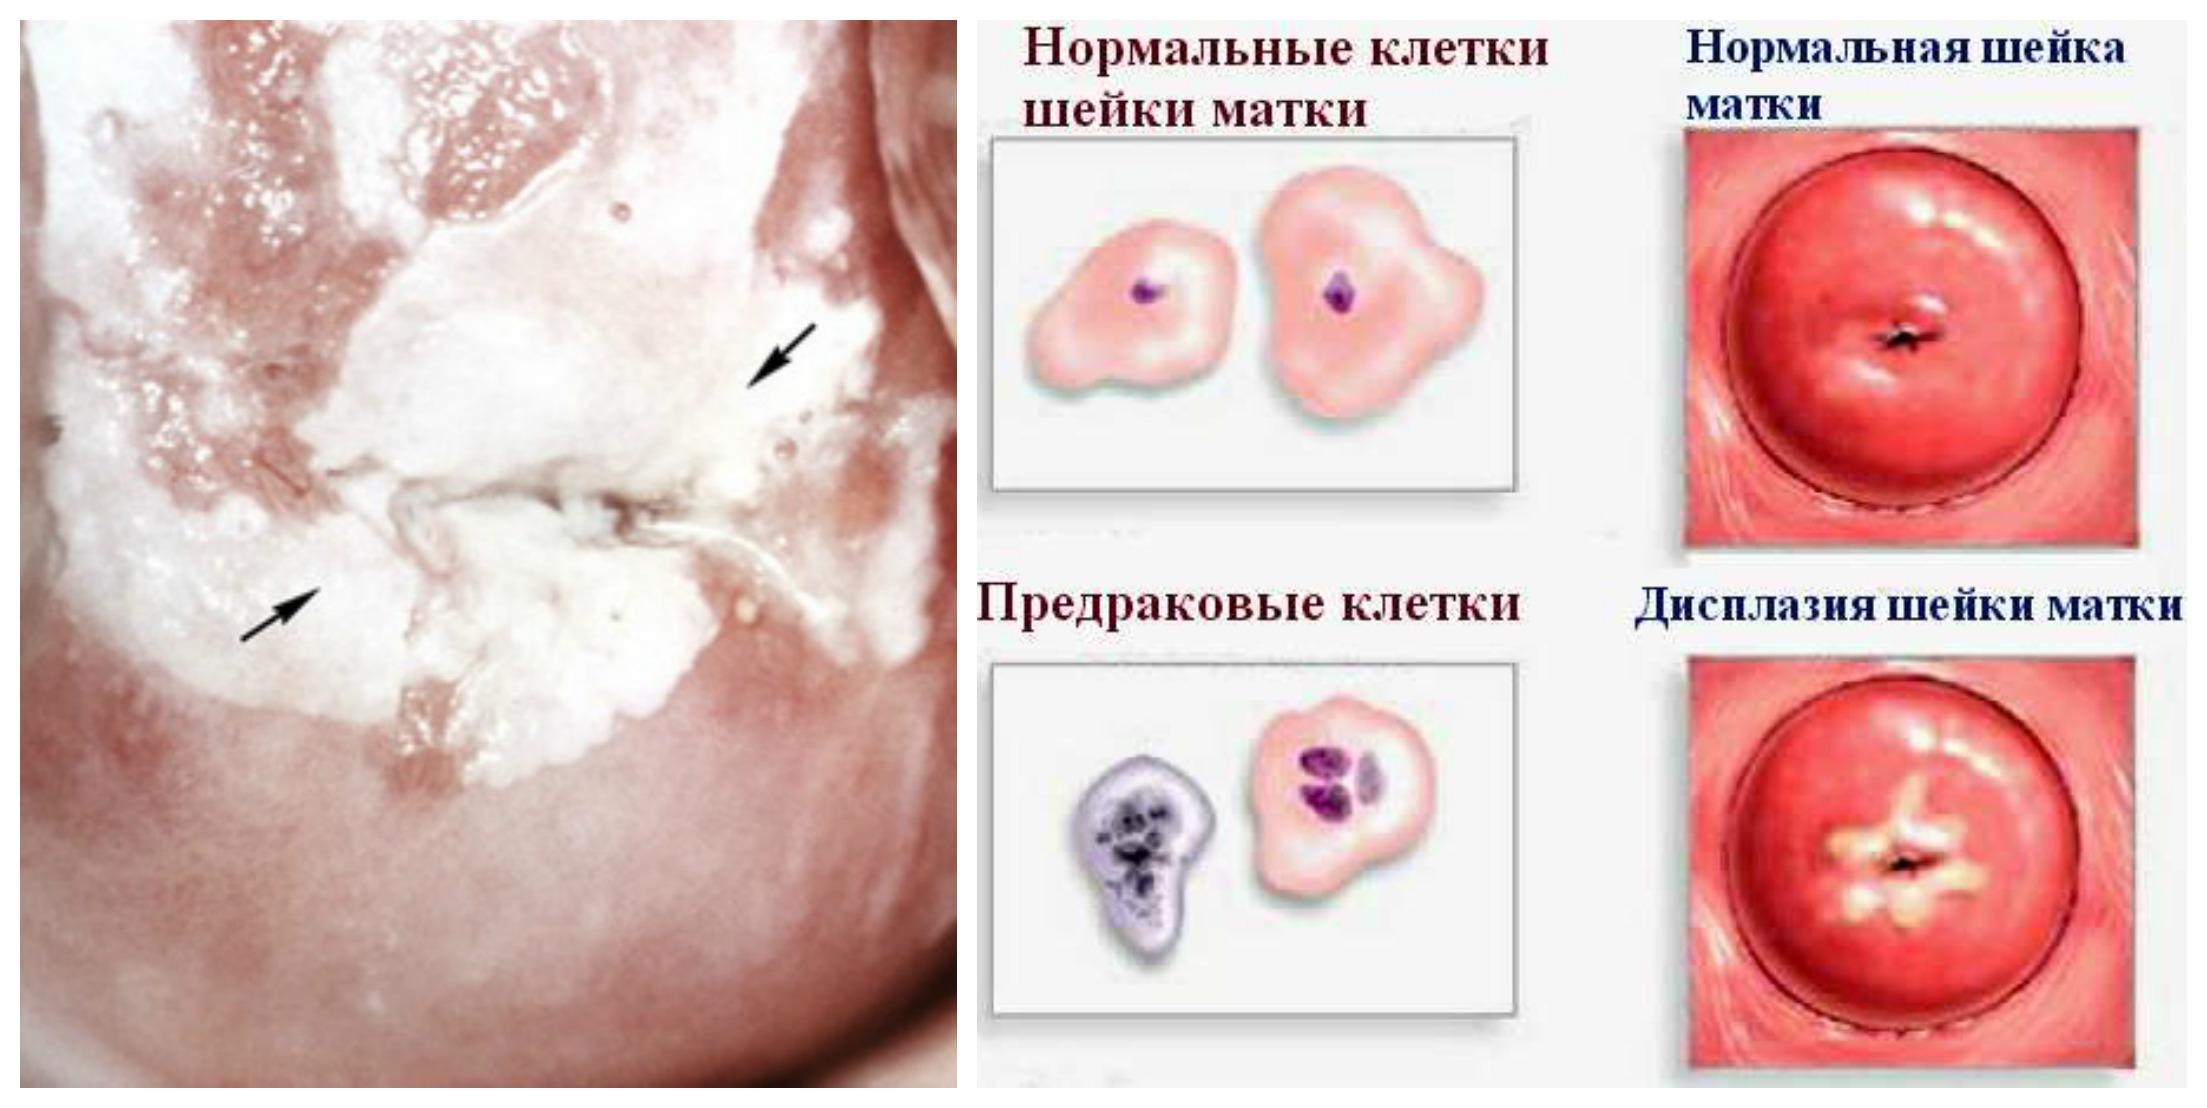 Меланоплакия фото